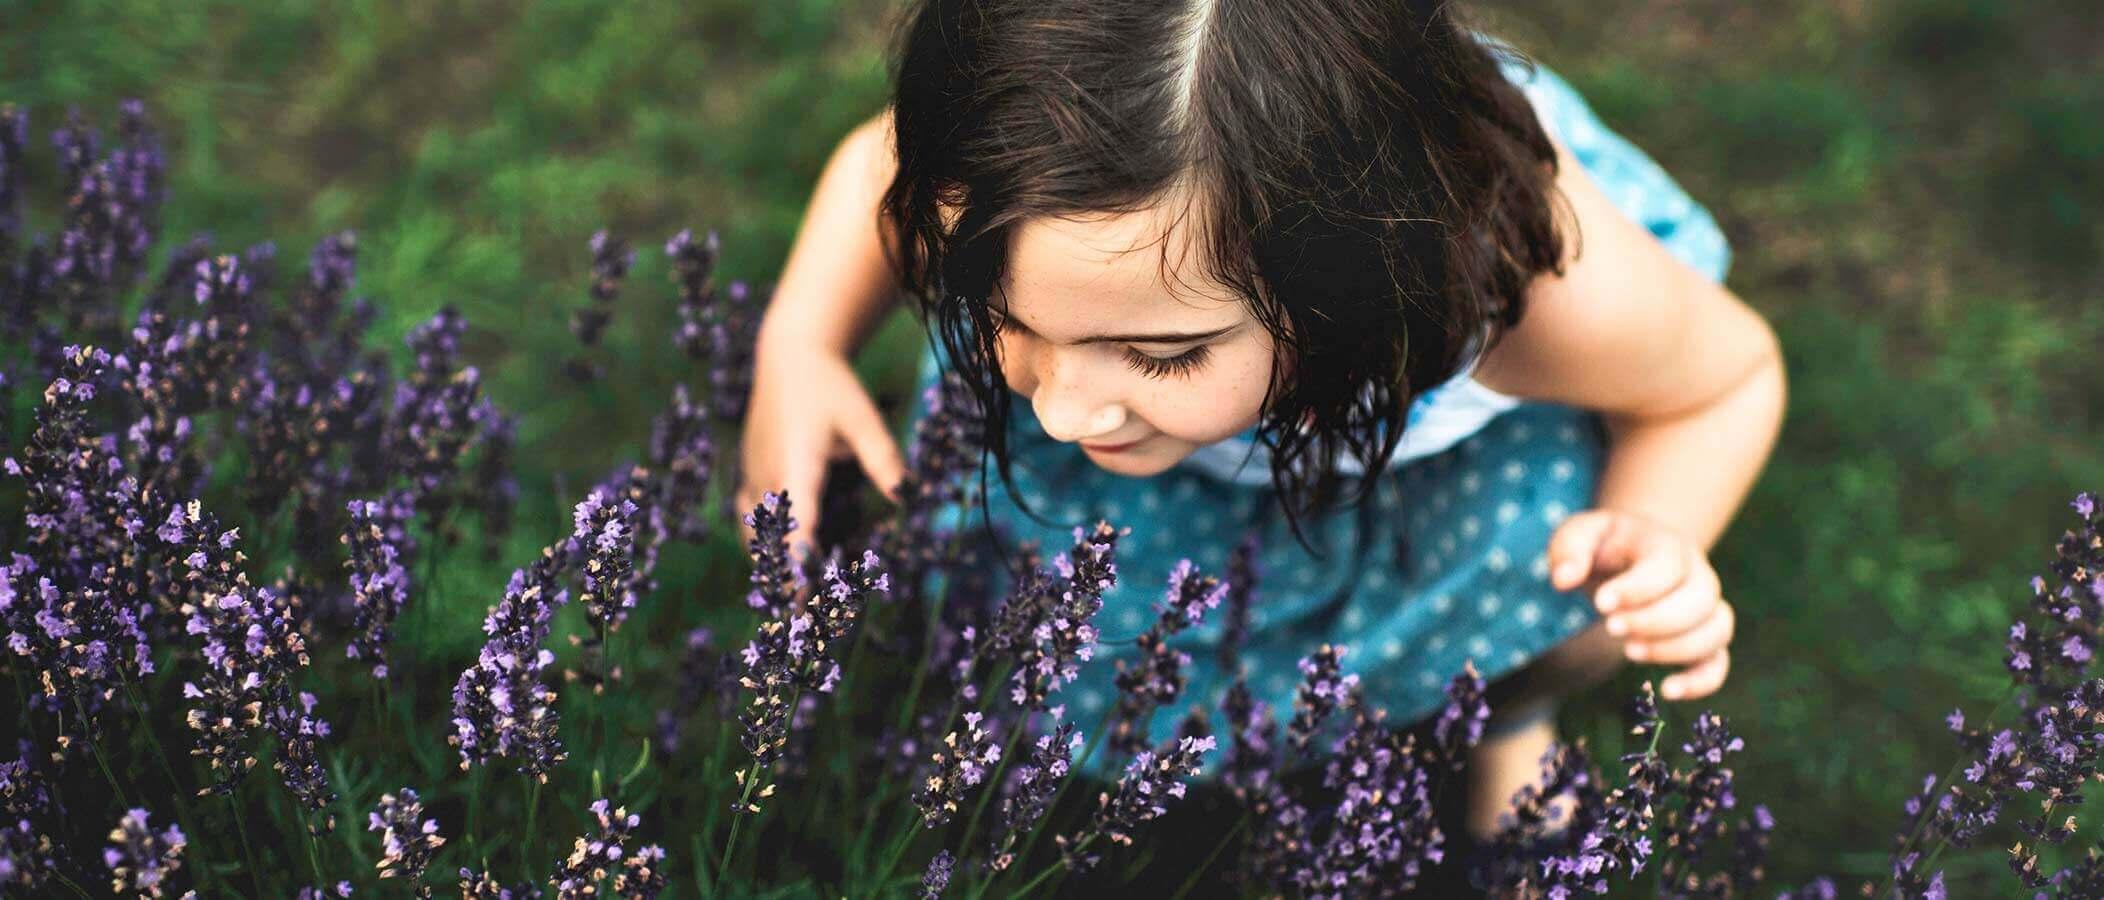 Ребенок, вдыхающий аромат цветов